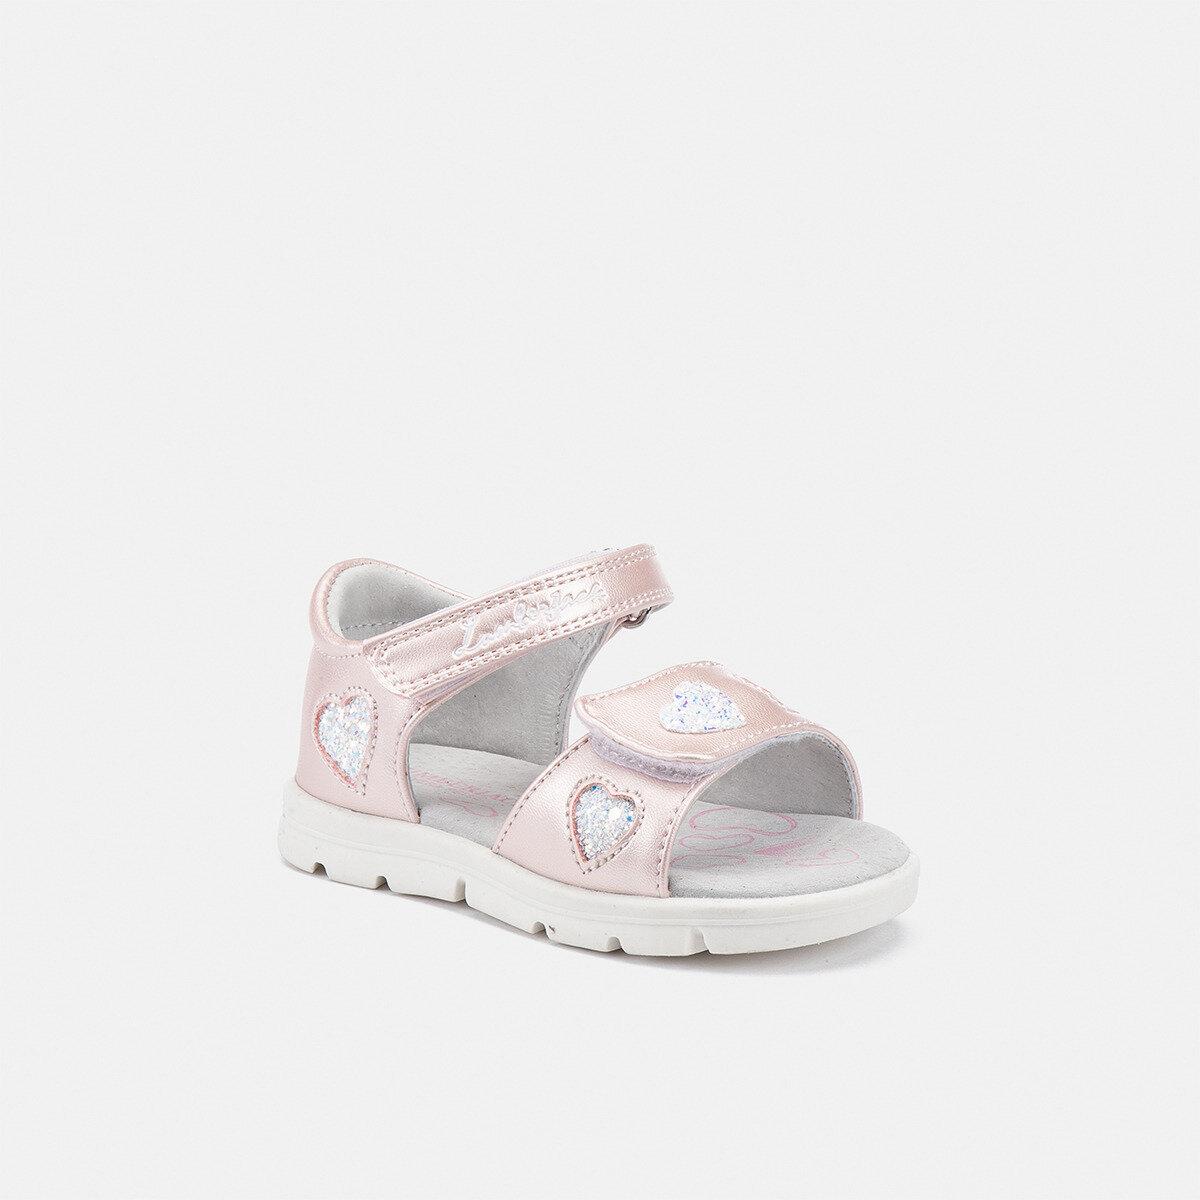 WHIPPY PINK/WHITE Girl Sandals